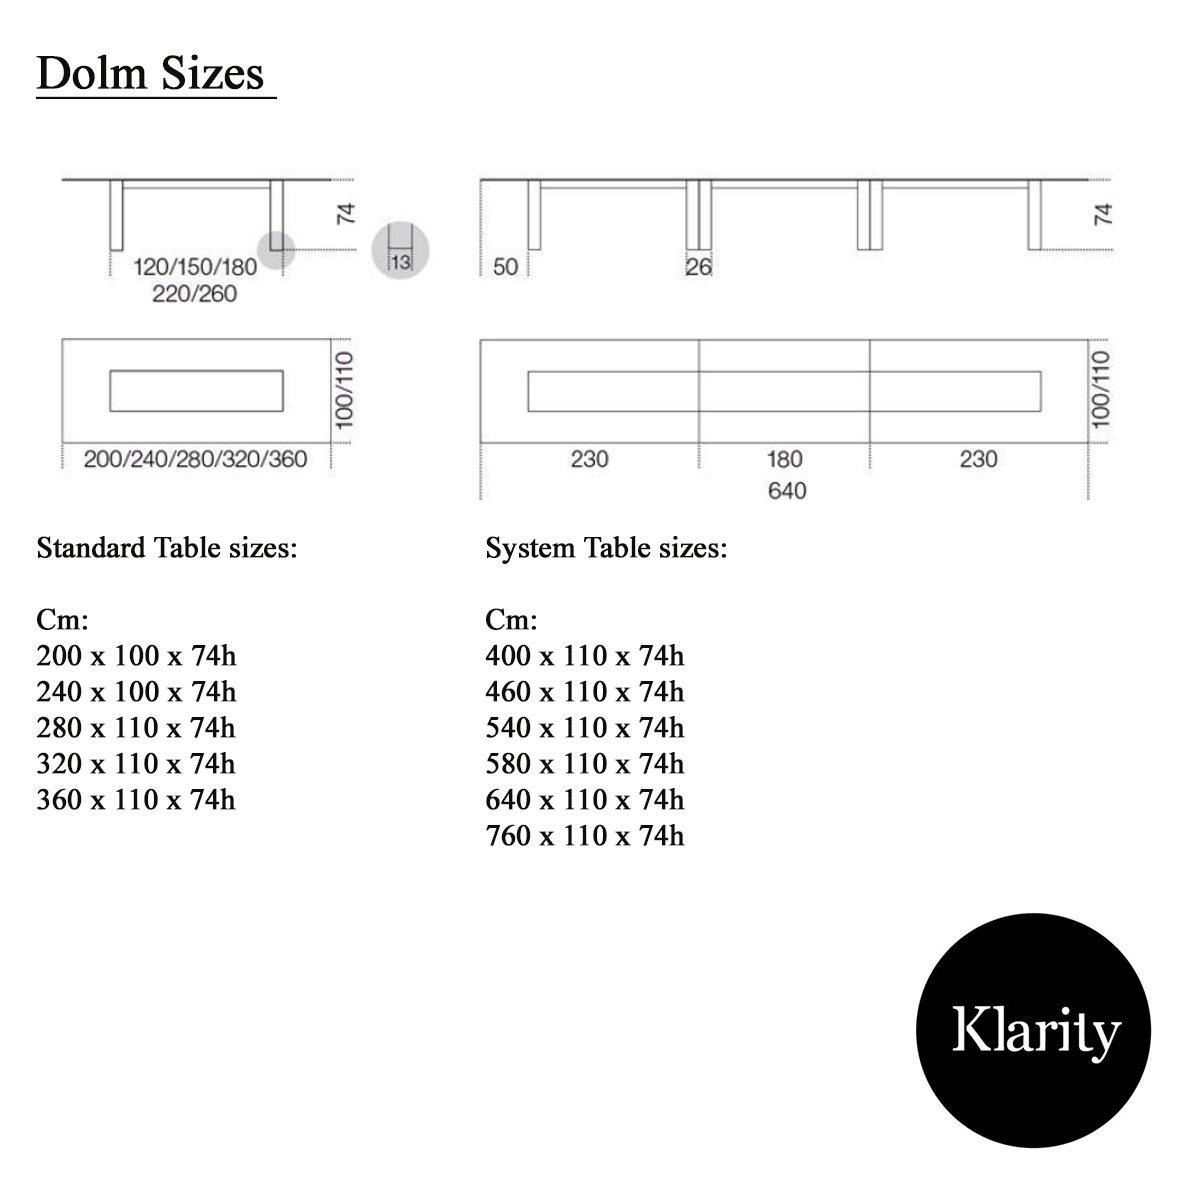 Dolm Gallotti and Radice sizes